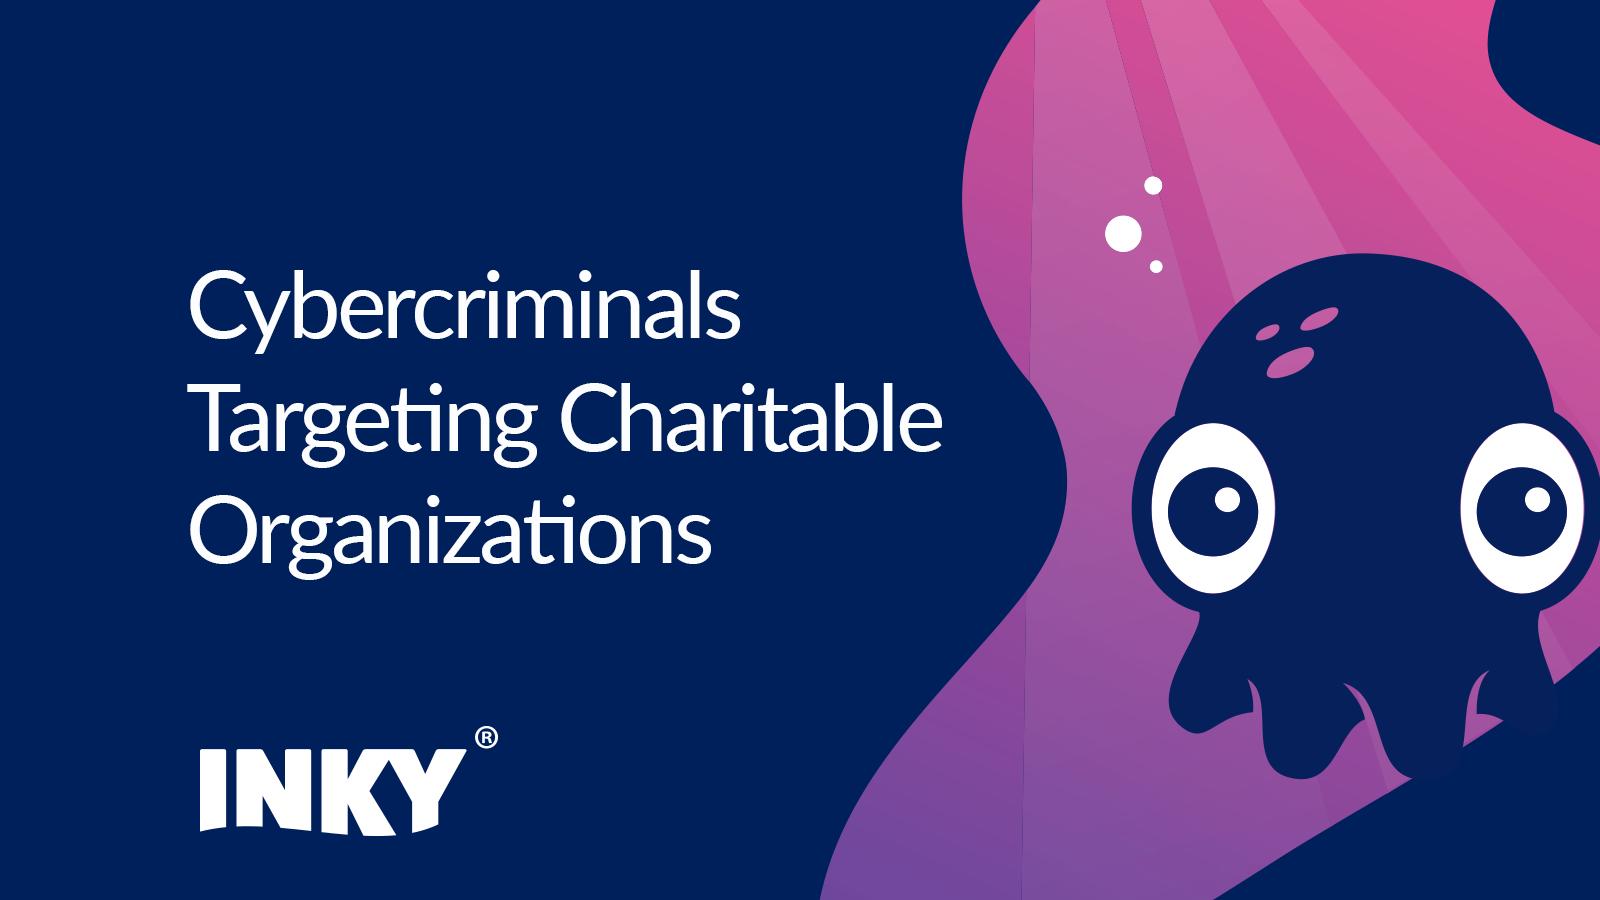 004 Cybercriminals Charitable Orgs